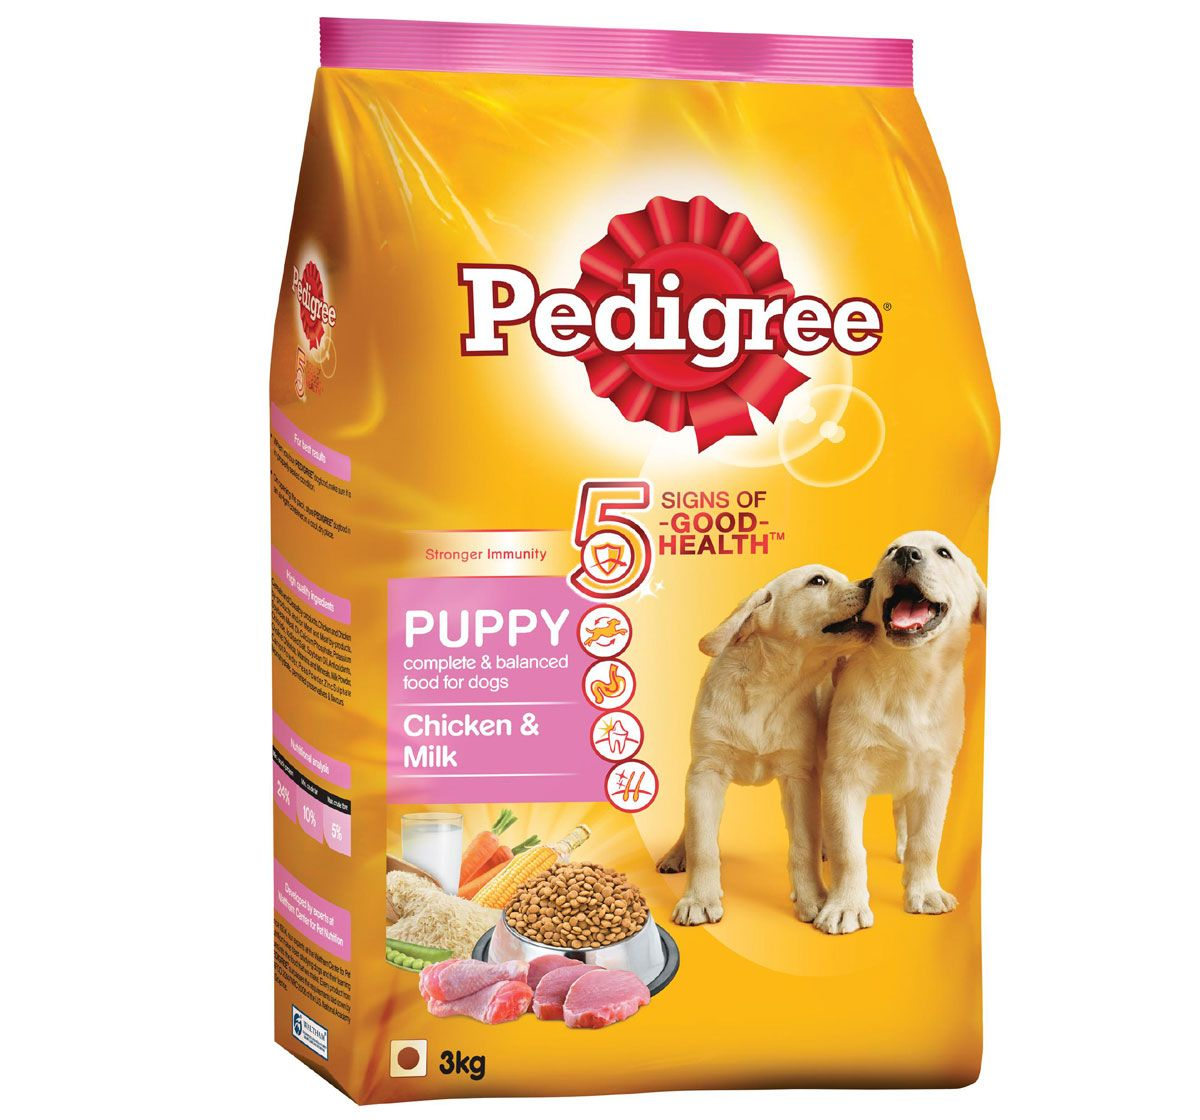 Kgs Pedigree Dog Food